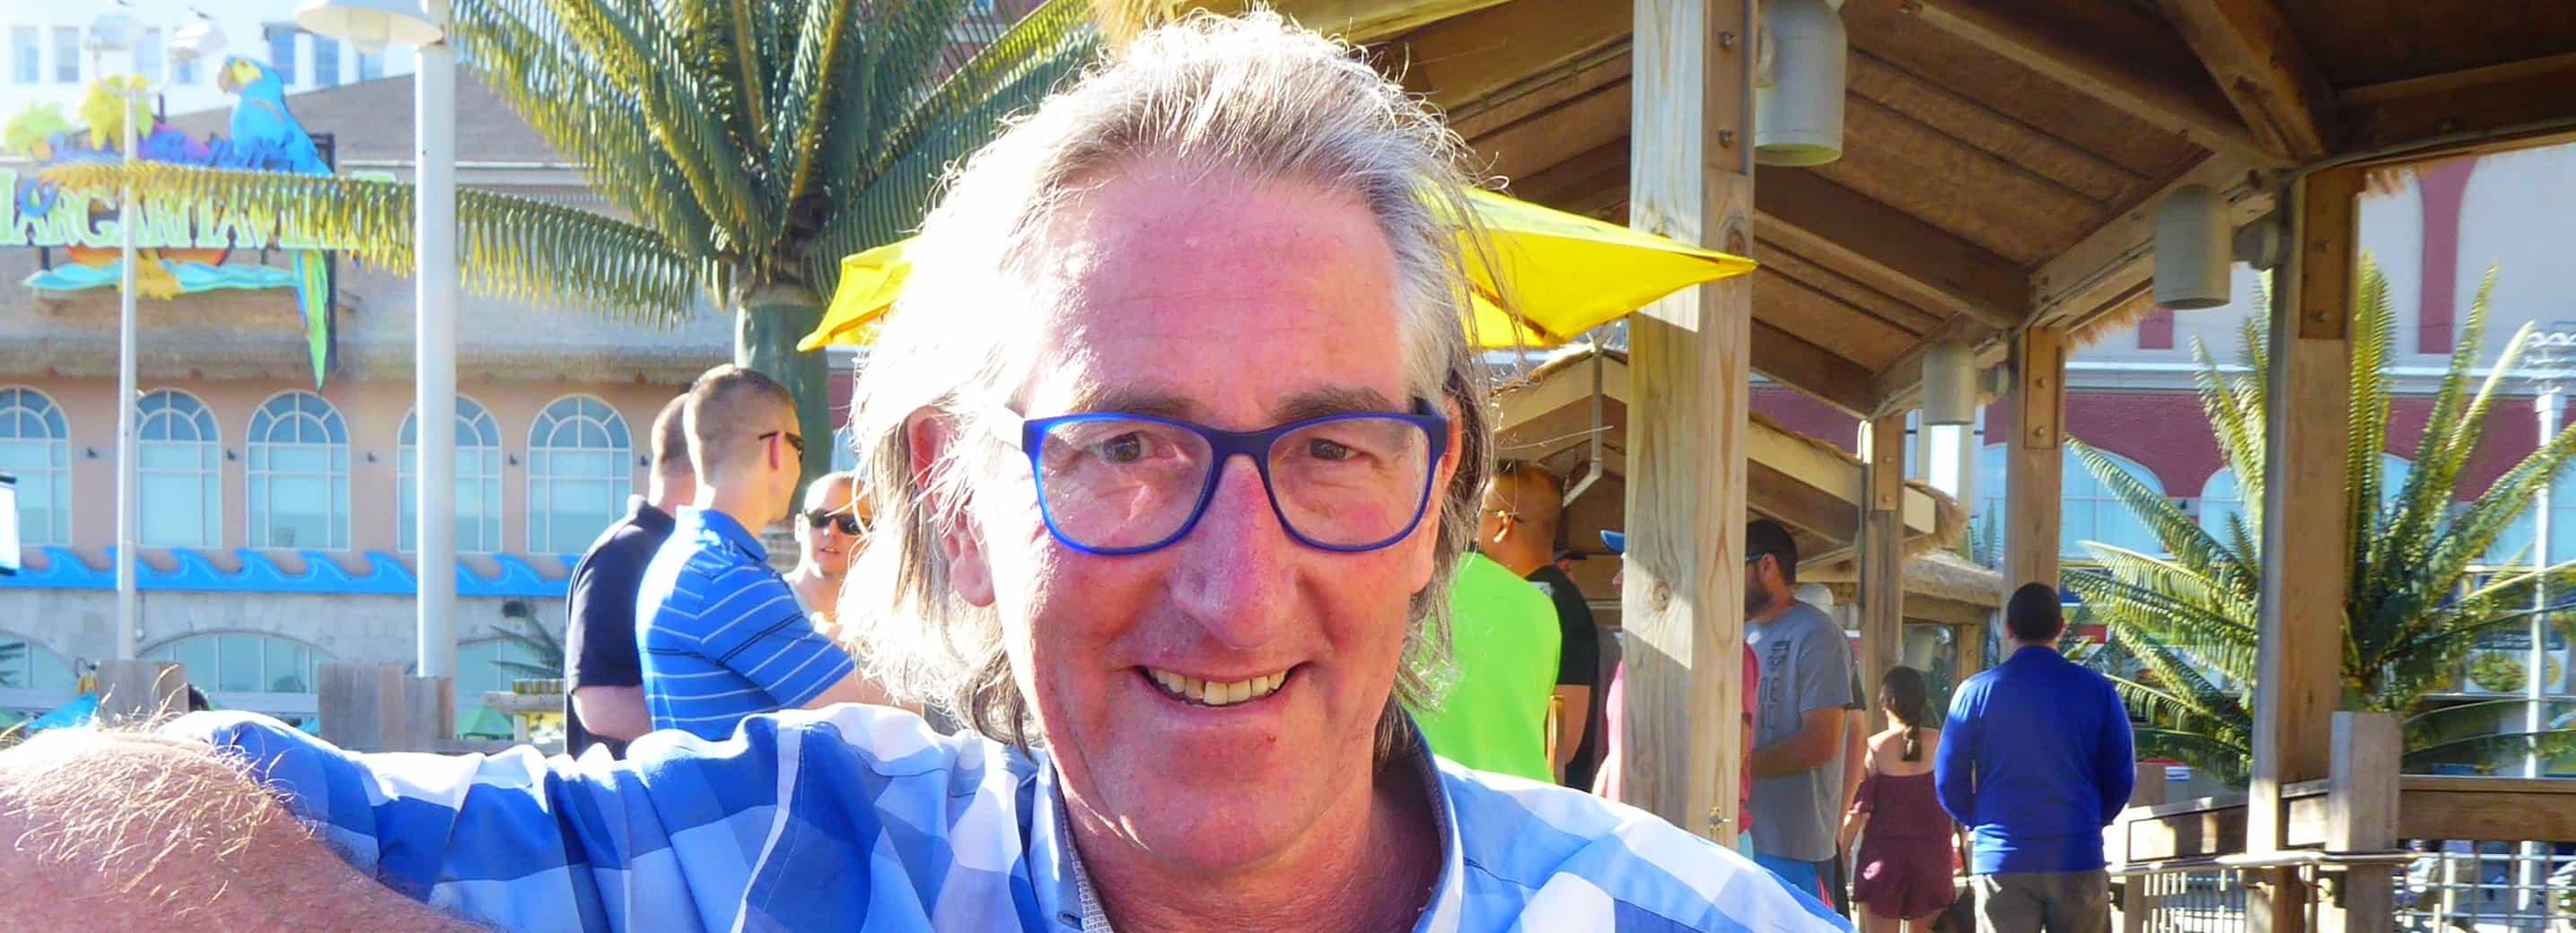 Peter van Hoeve op Radio Apeldoorn